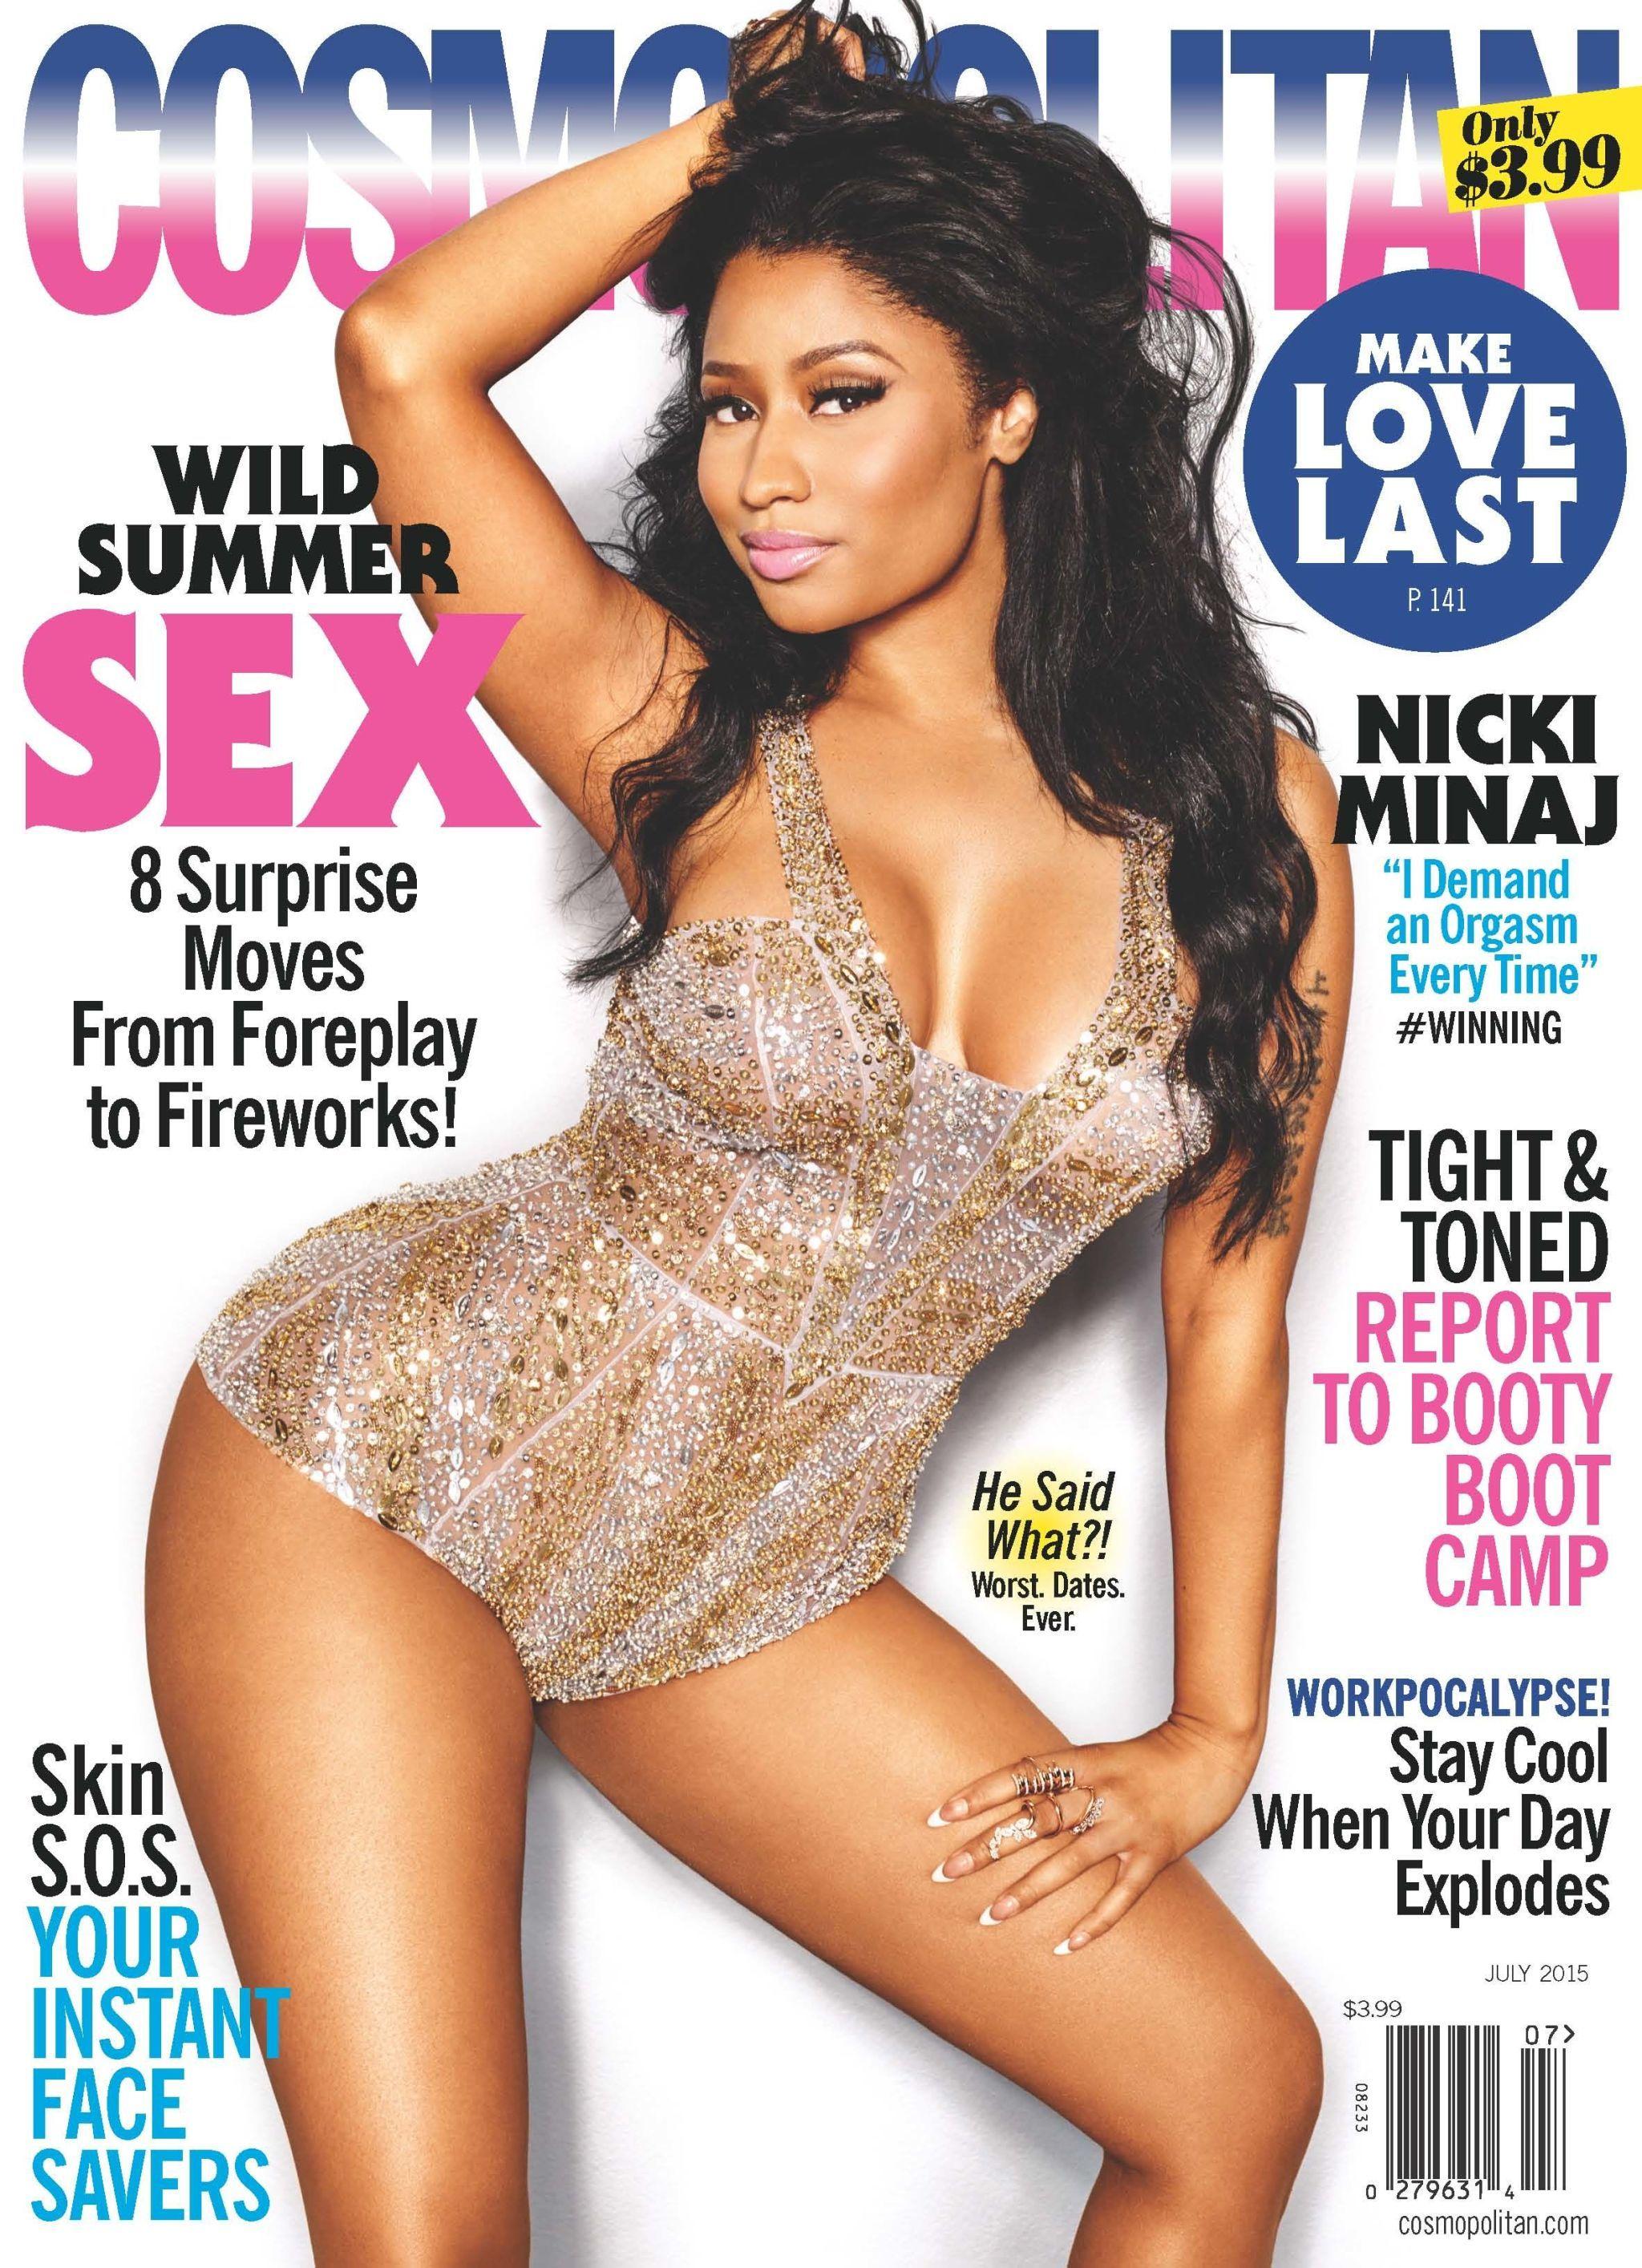 Nicki Minaj News, Nicki Minaj Songs, Nicki Minaj Videos - Hip Hop Lead